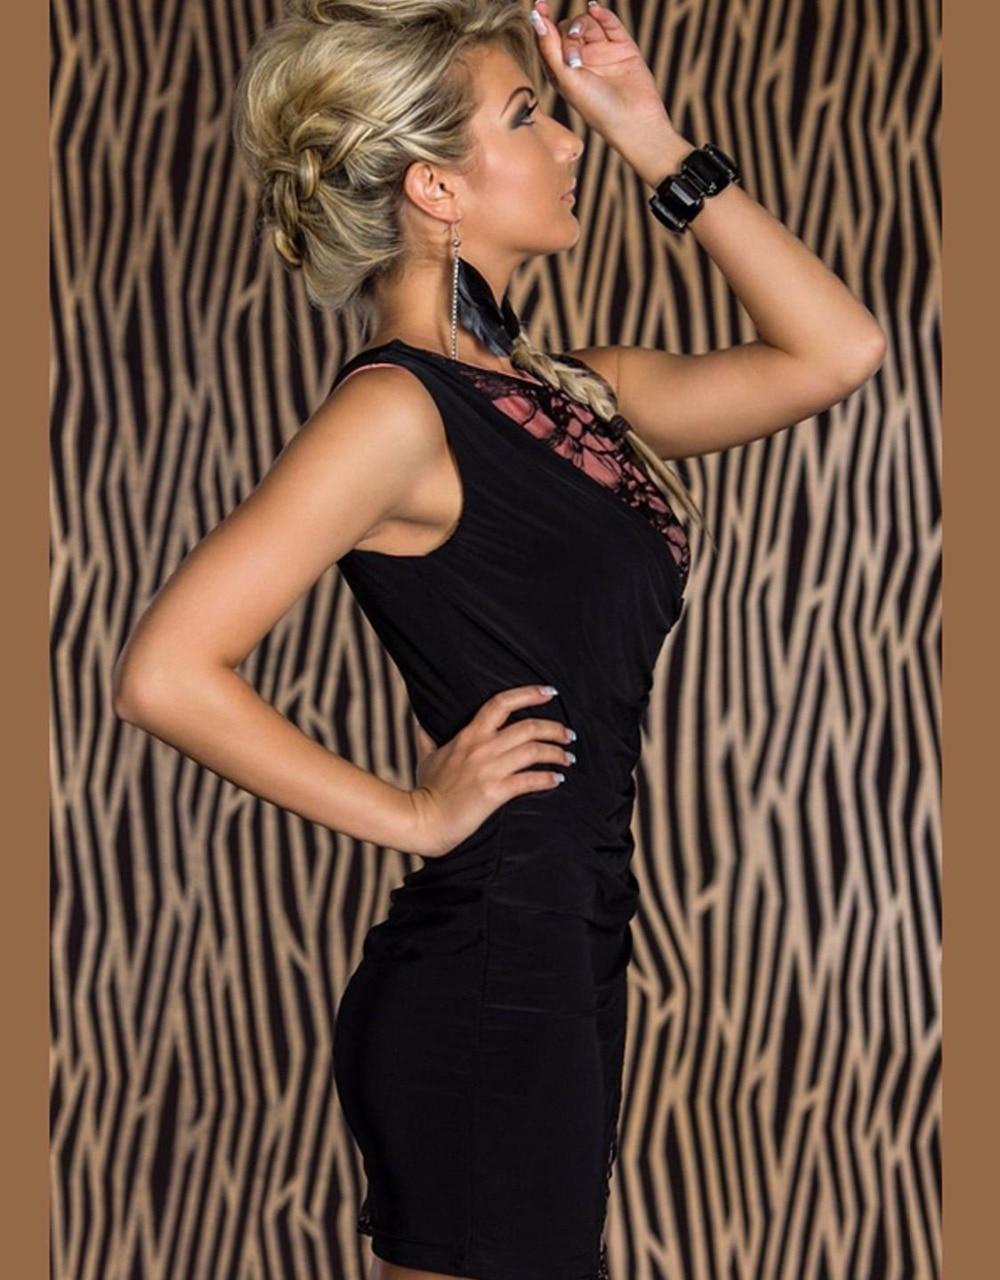 Tank Sleeveless Dress Women Sexy Party Vestidos Drapery Summer Plus Size Patchwork Design Nightclub Bodycon Dresses 2XL